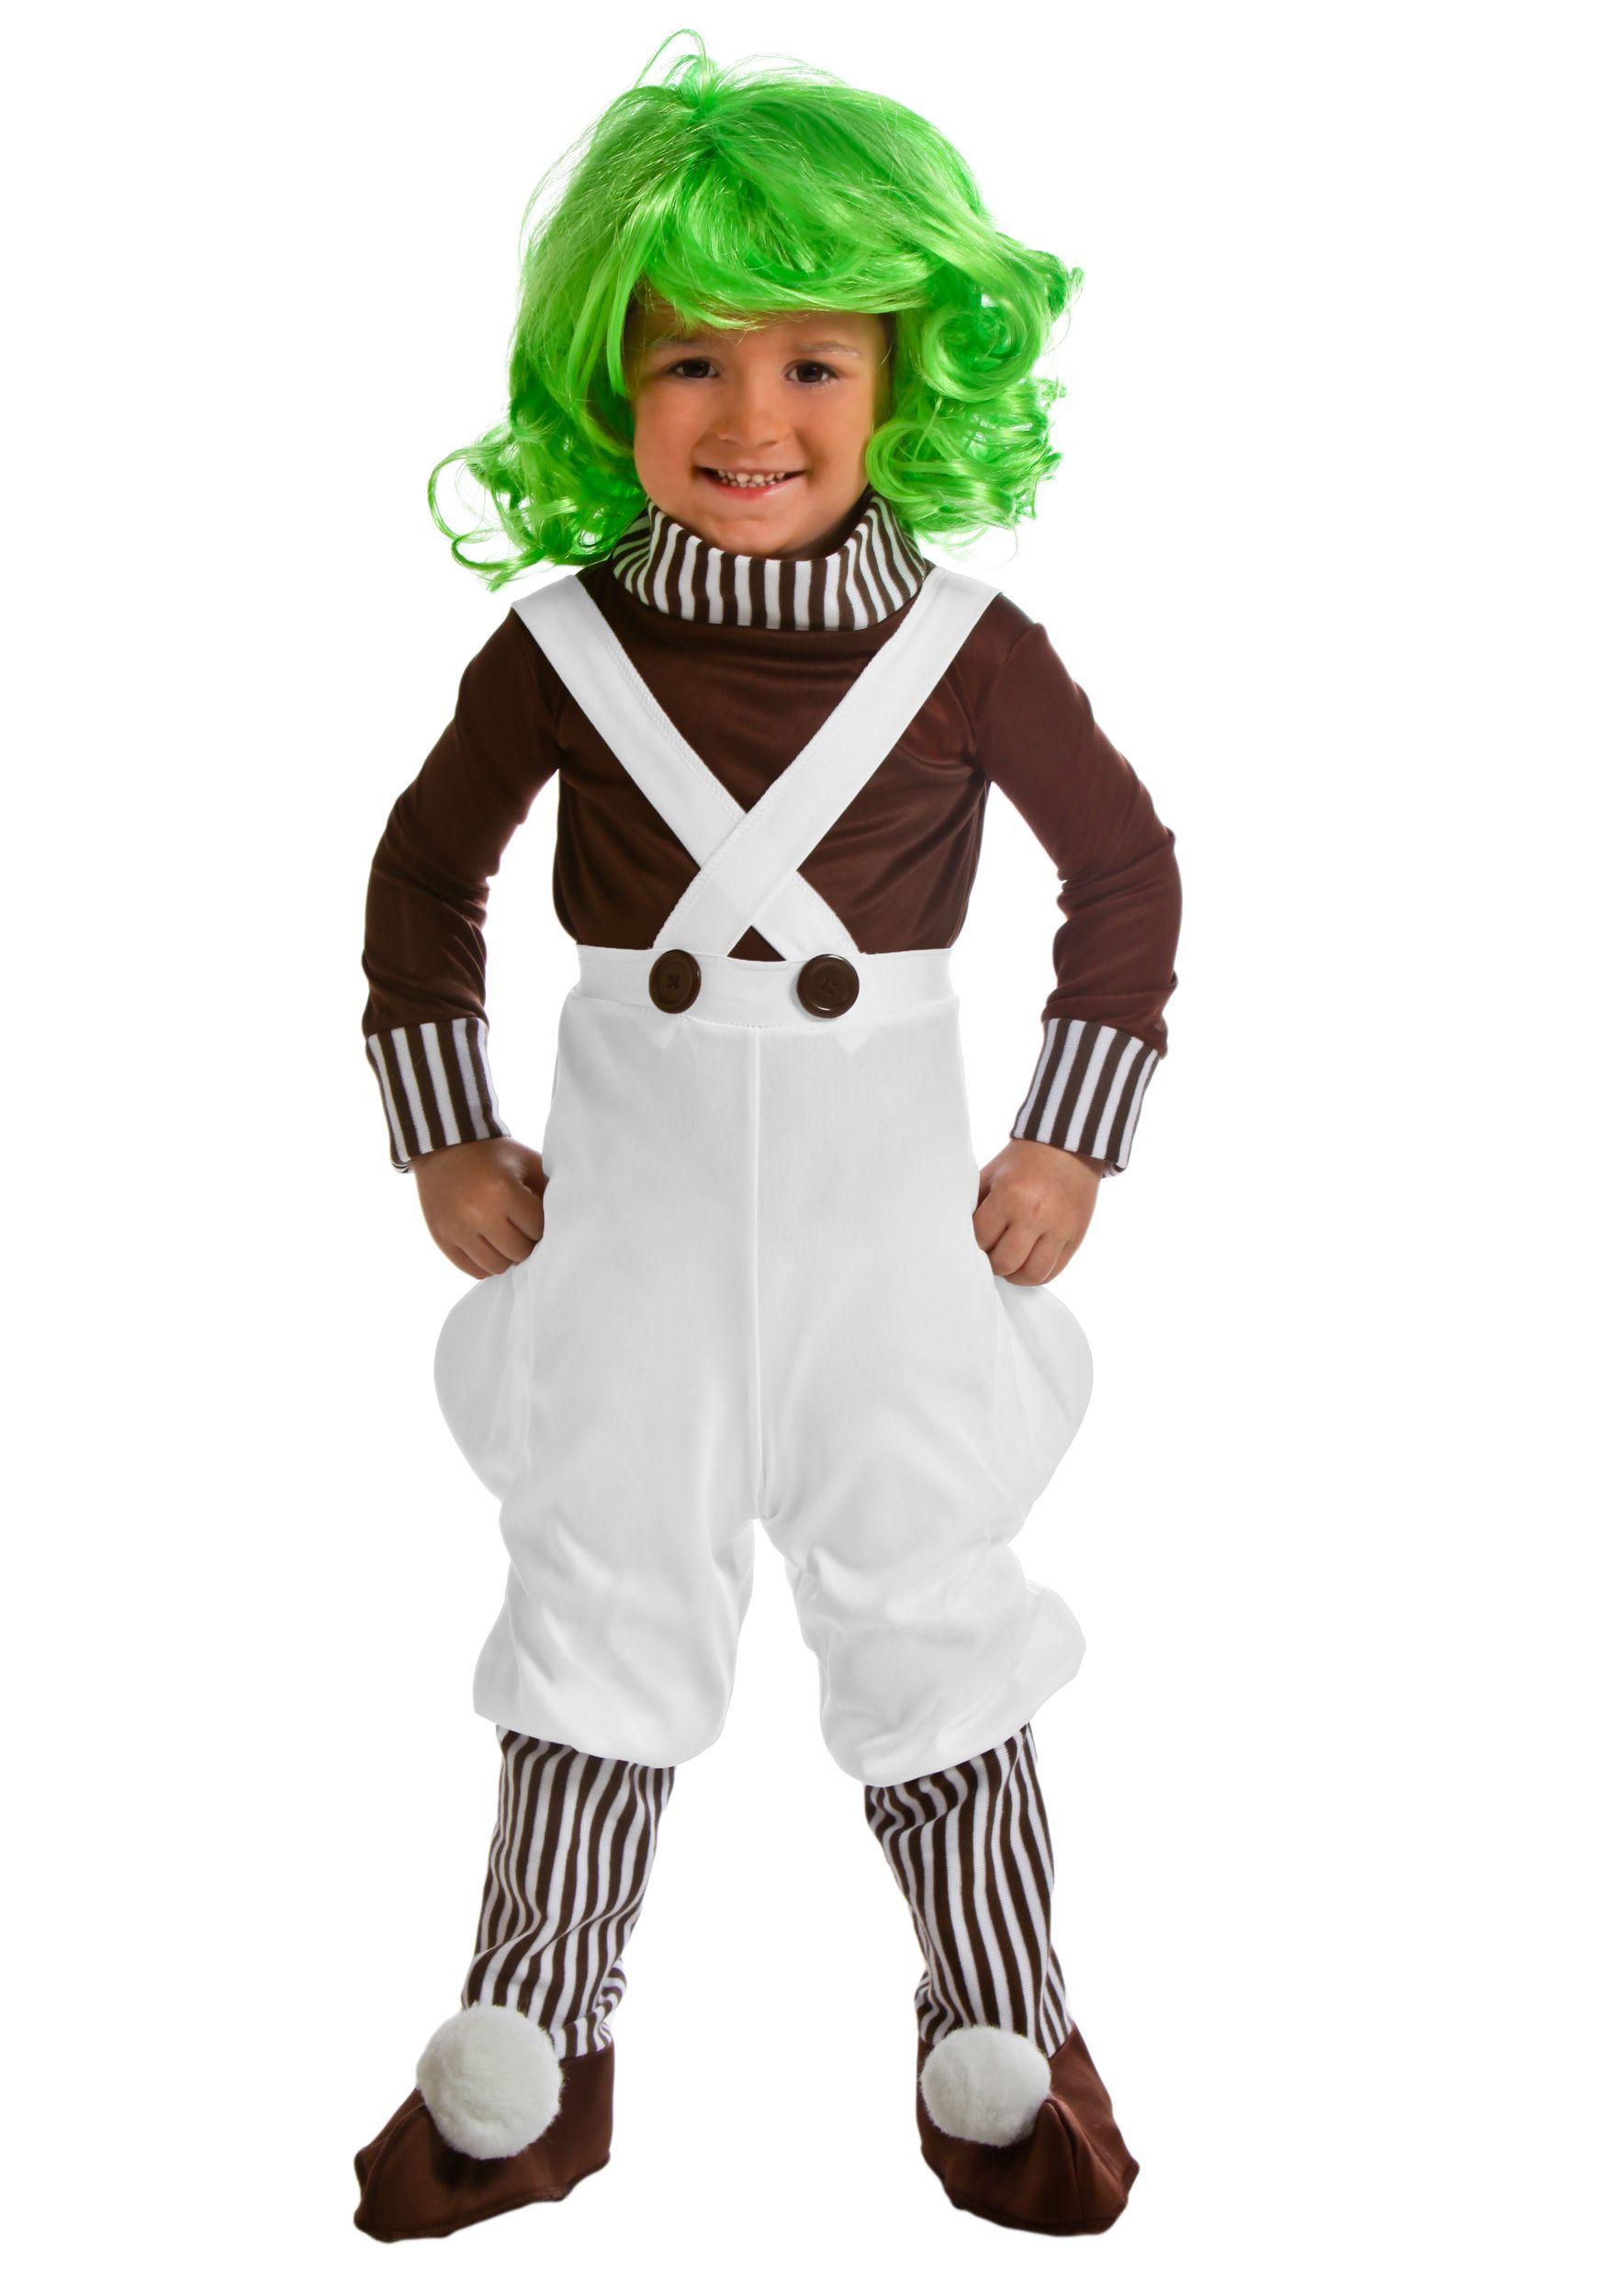 Chocolate Factory Worker Toddler Costume - Oompa Loompa Costumes  sc 1 st  Pinterest & Oompa Loompa-Arjunu0027s costume this year minus the wig.. | Arjun ...